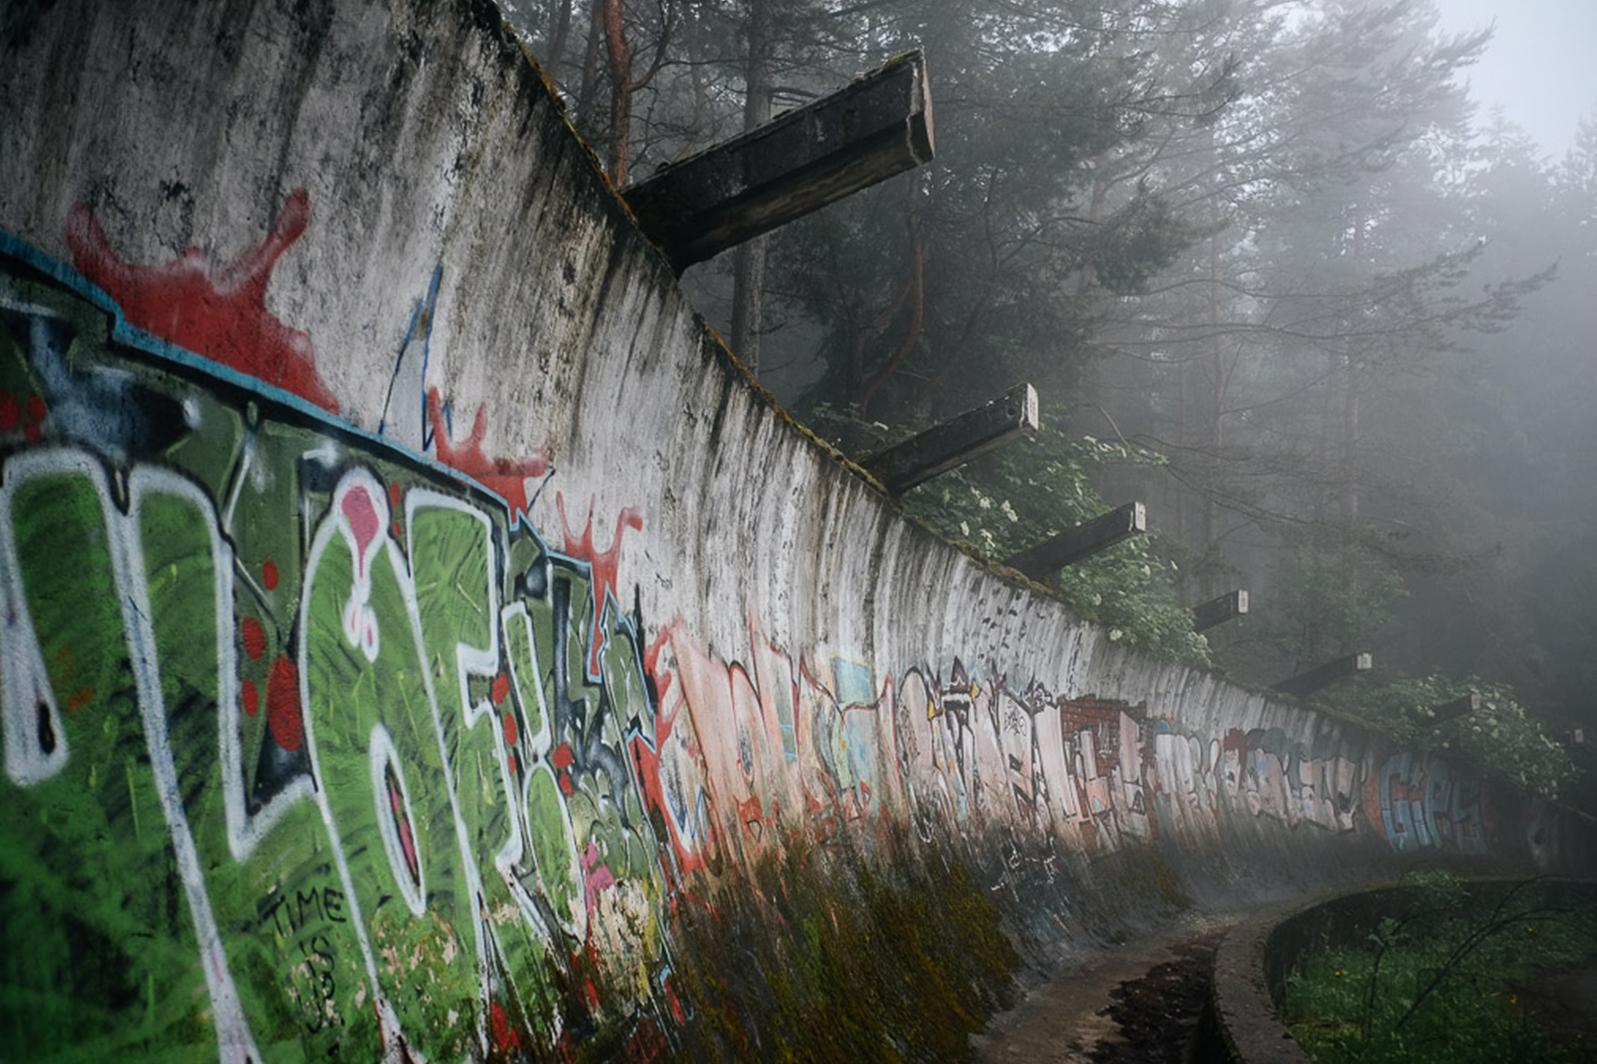 urbex sarajevo piste bobsleigh jo - Berlin, Sarajevo, Athènes : les sites des Jeux Olympiques version urbex